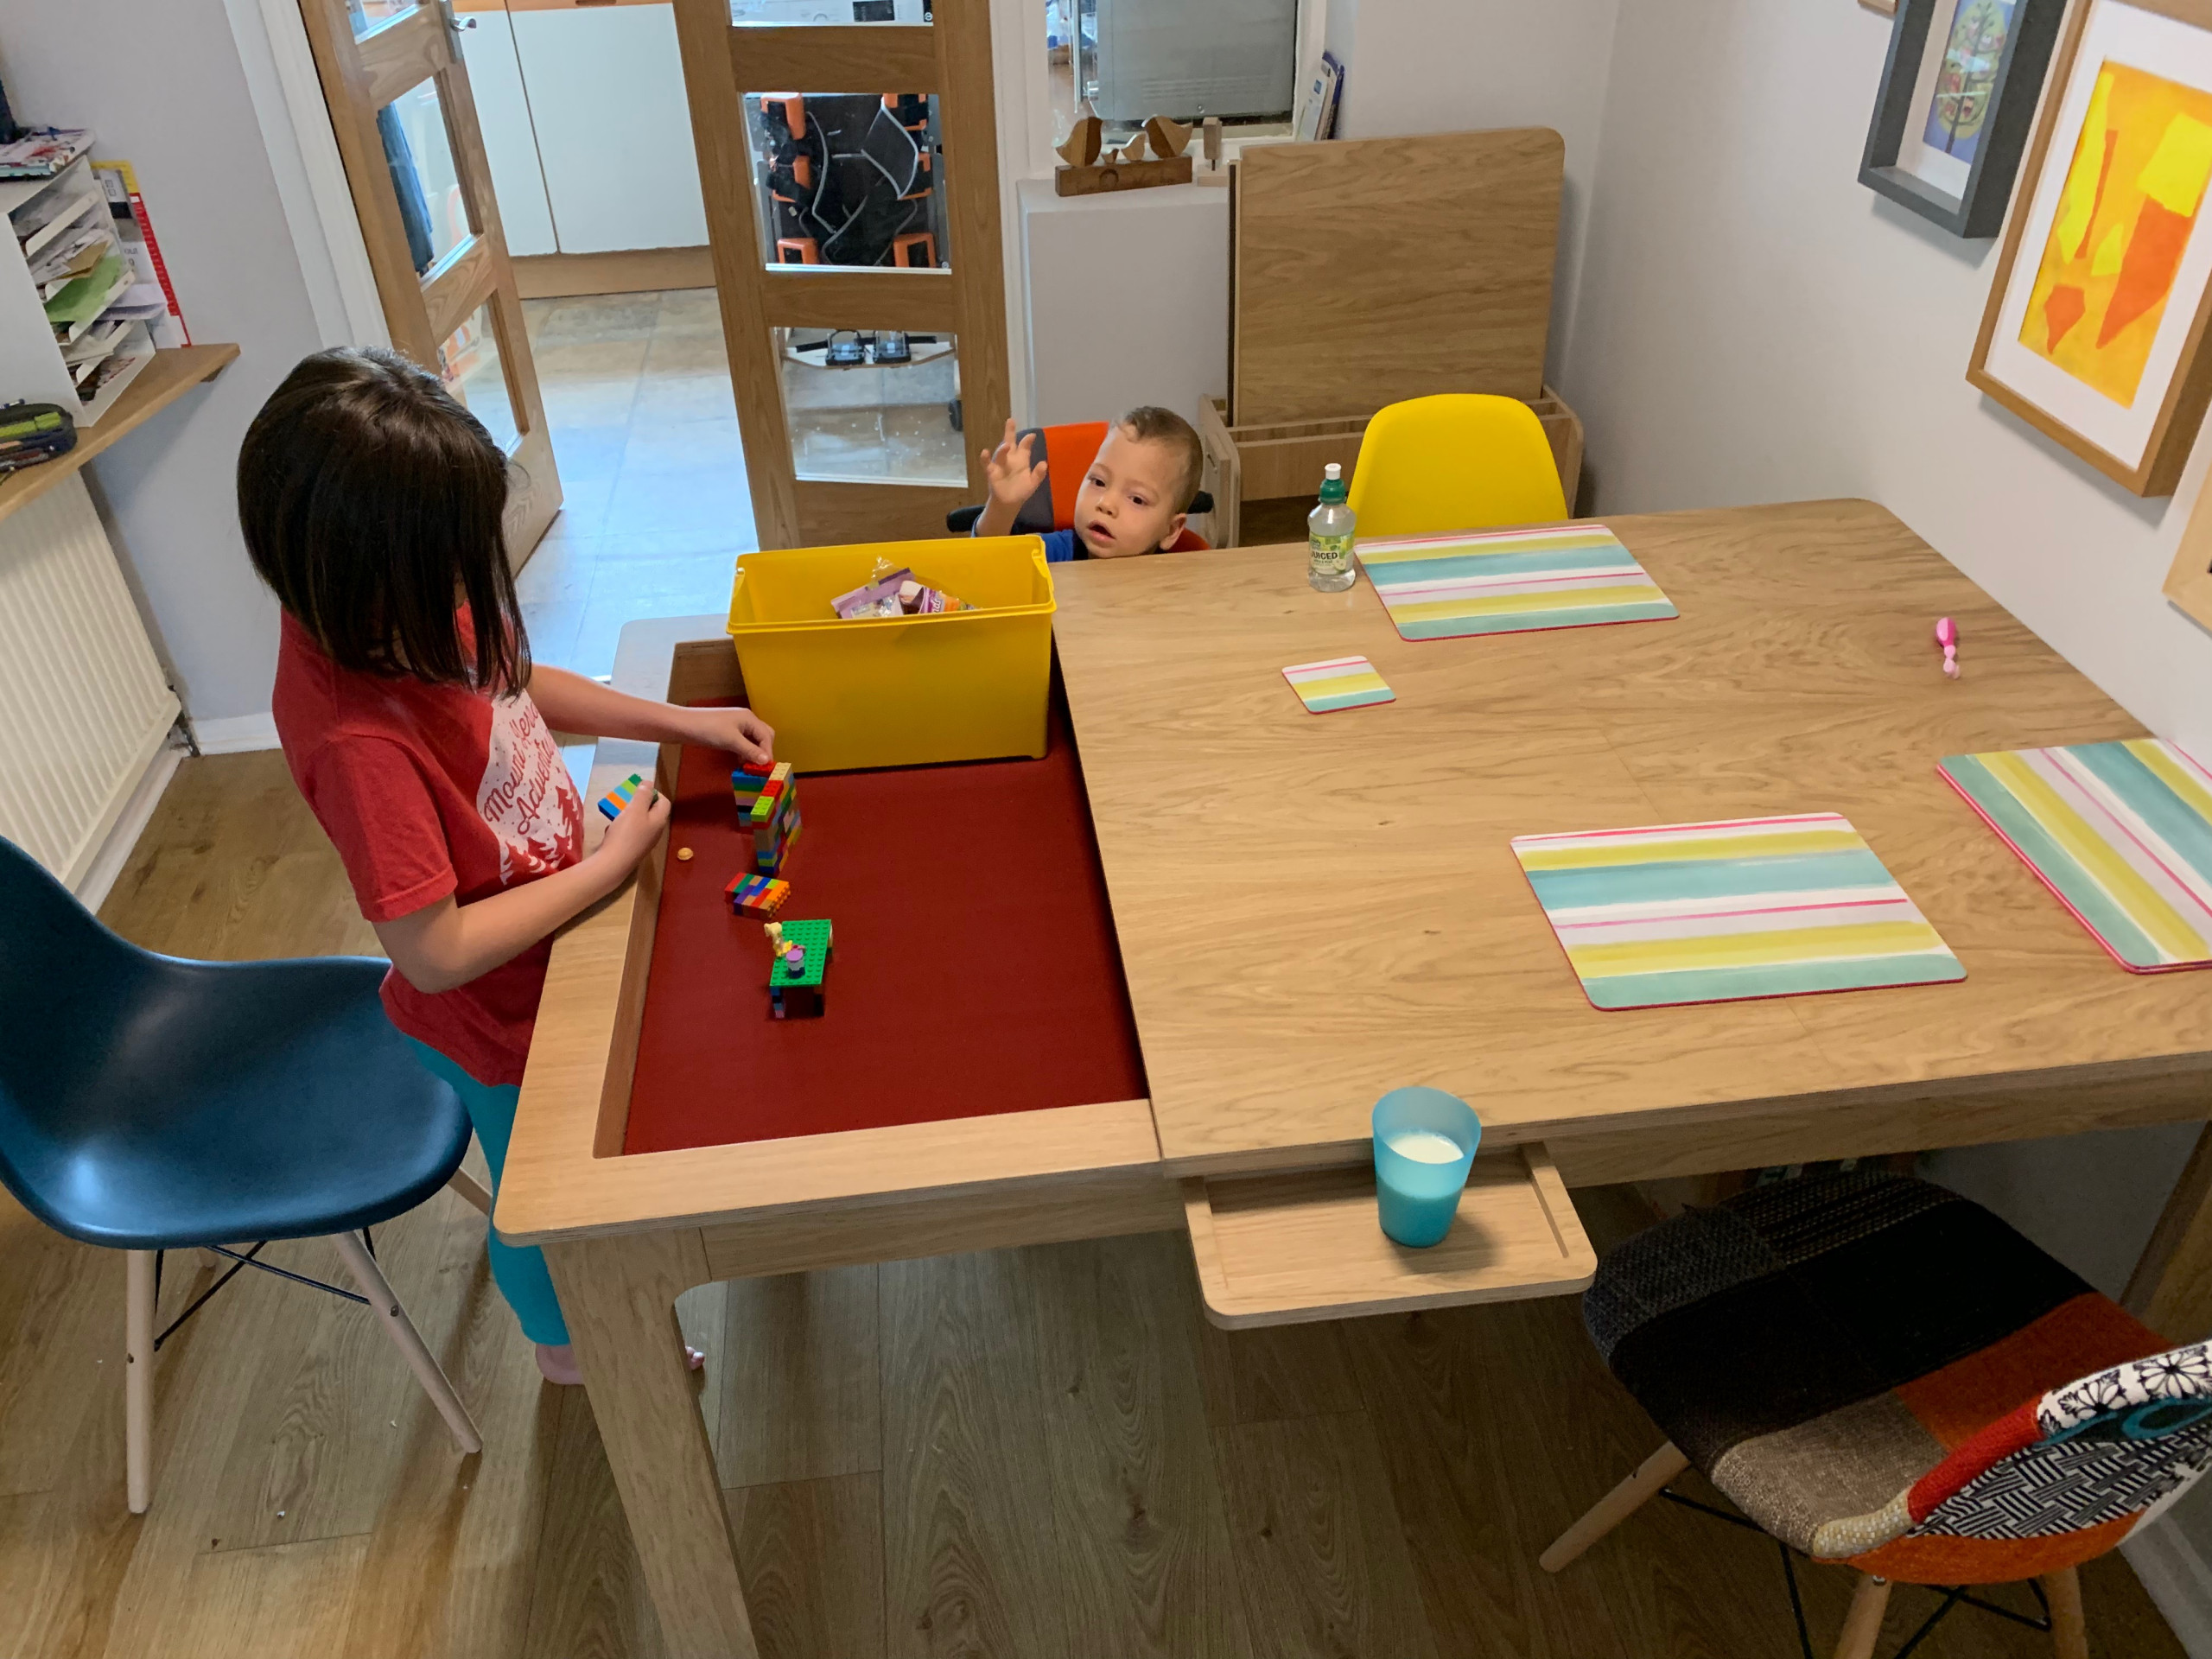 The Freebird Gaming Table